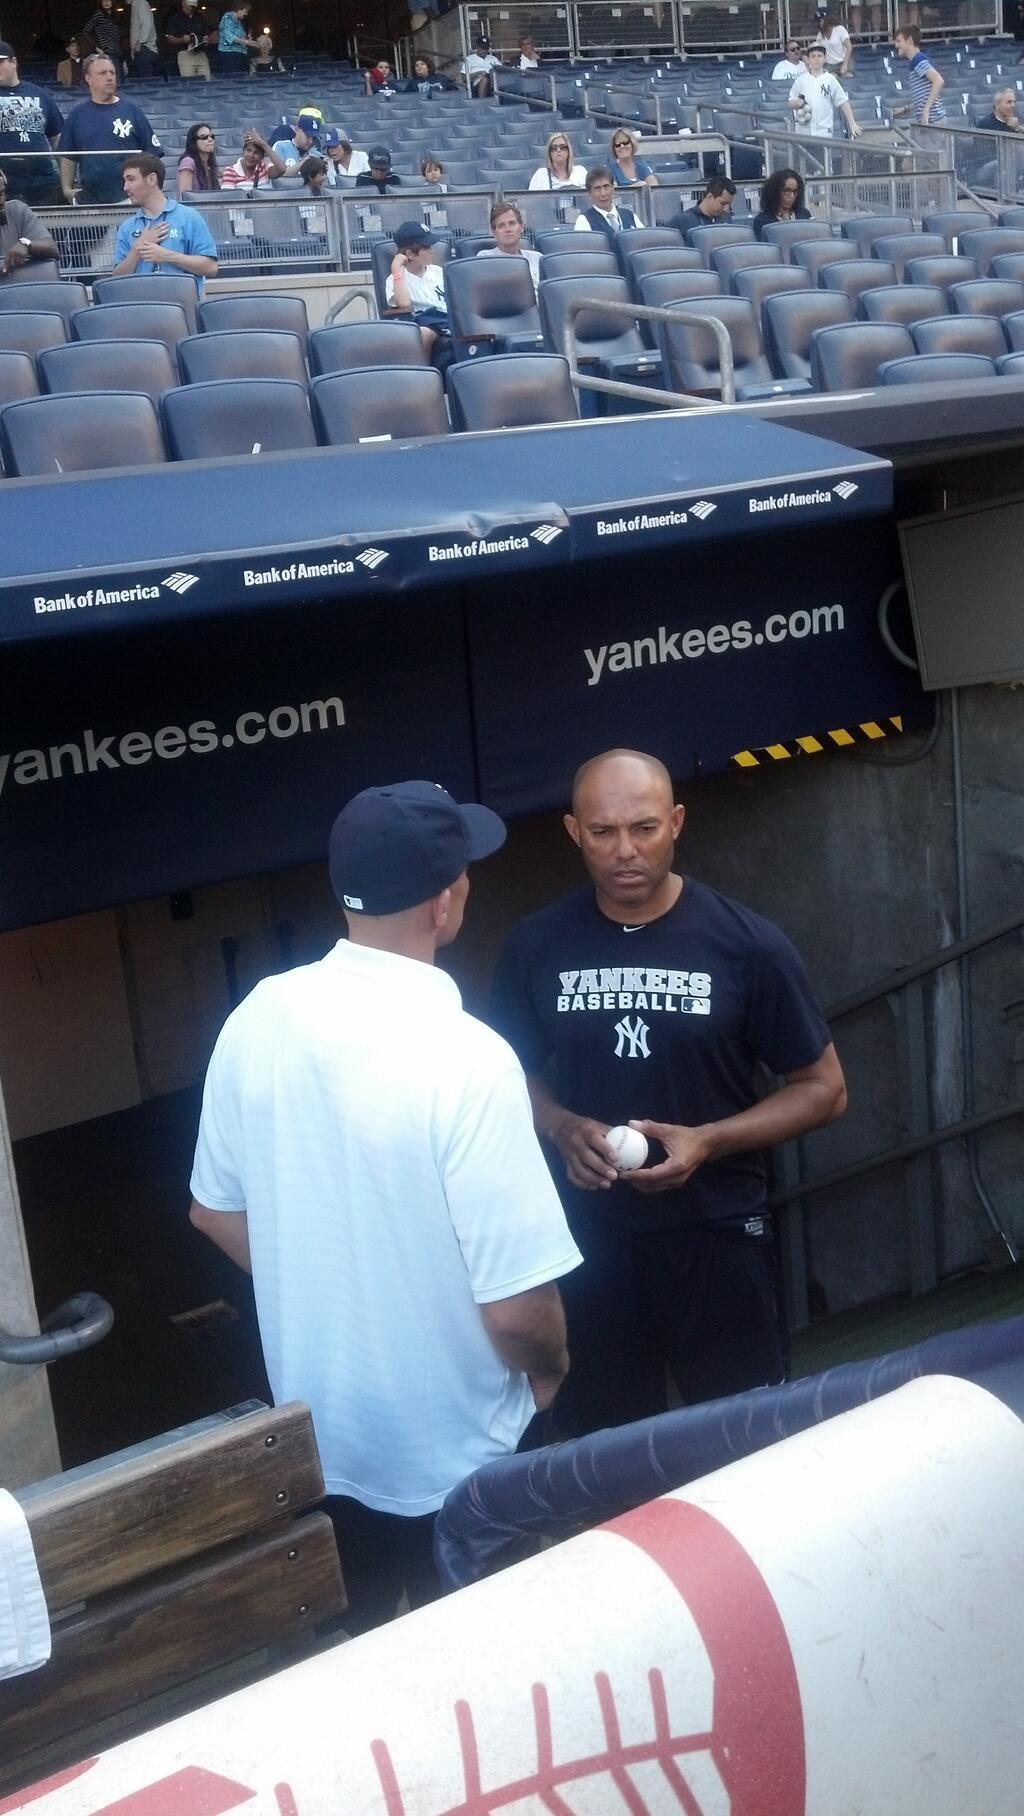 Jason Kidd meets Mariano Rivera